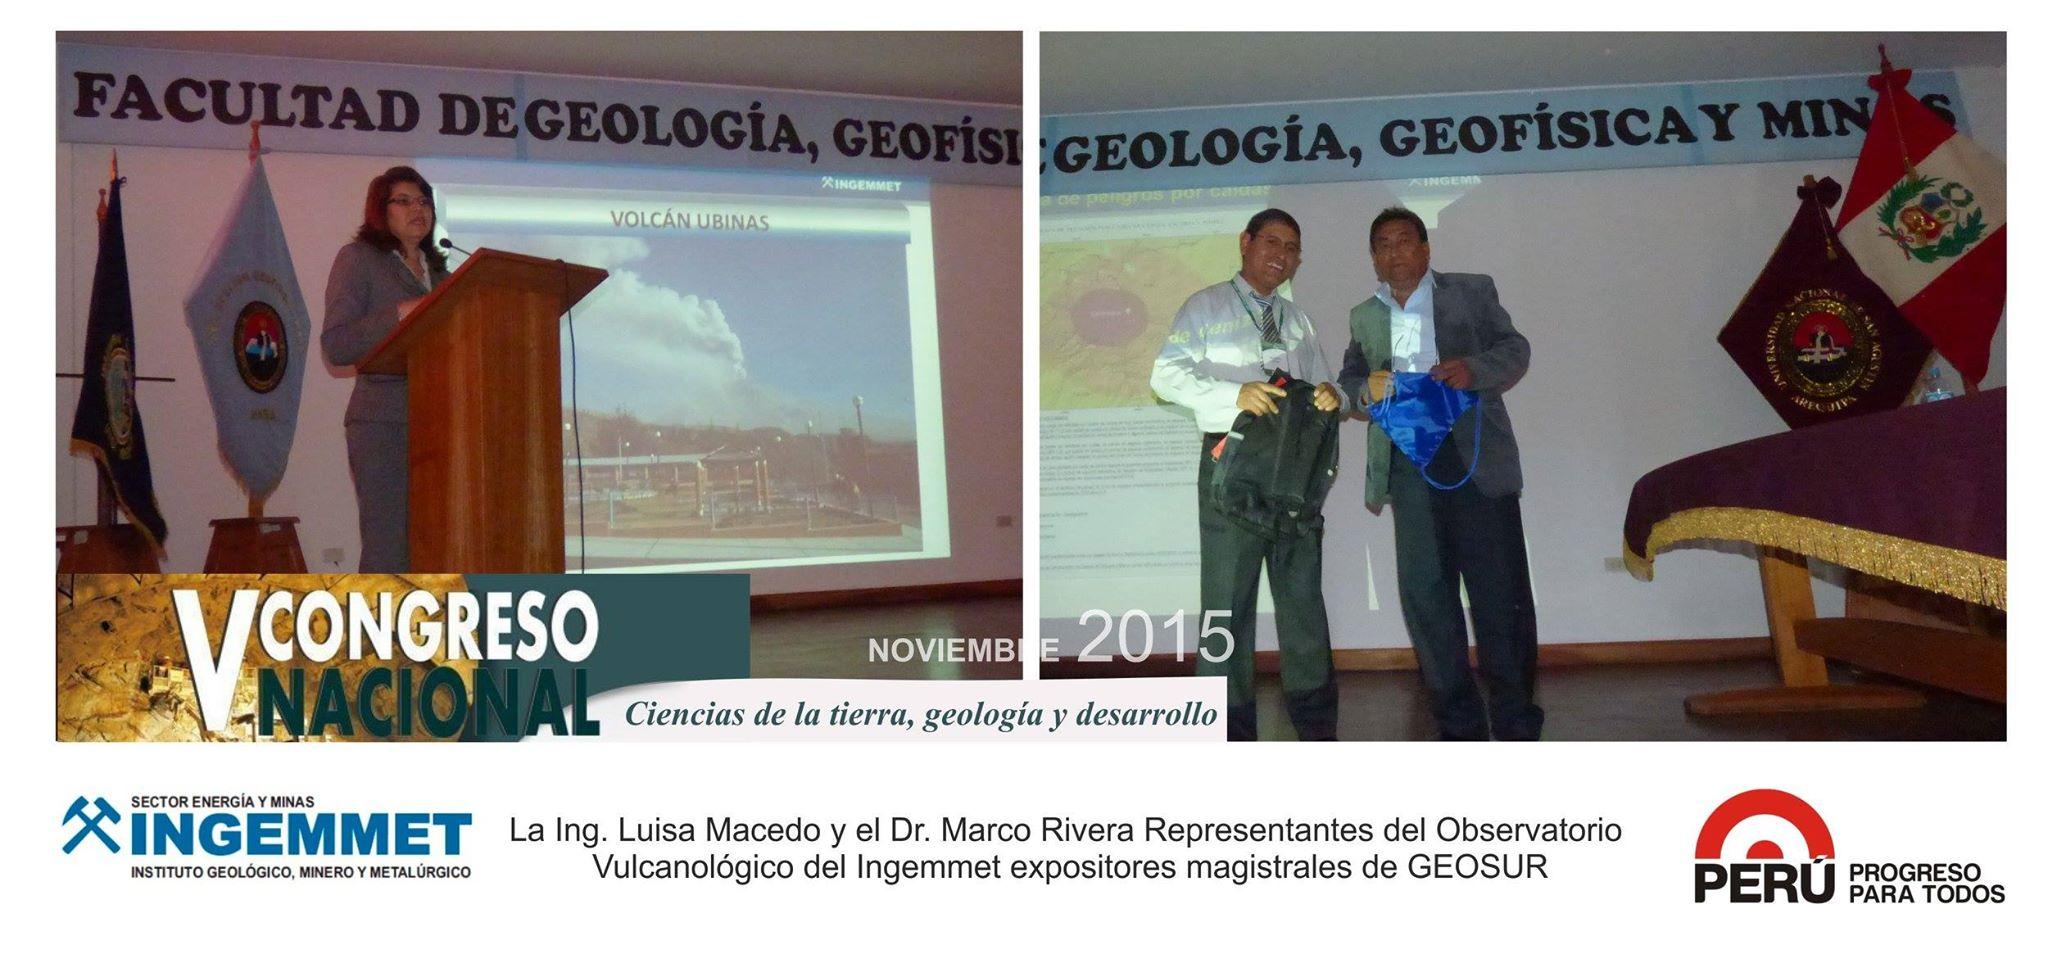 ESPECIALISTAS DEL INGEMMET EXPONEN EN CONGRESO GEOSUR